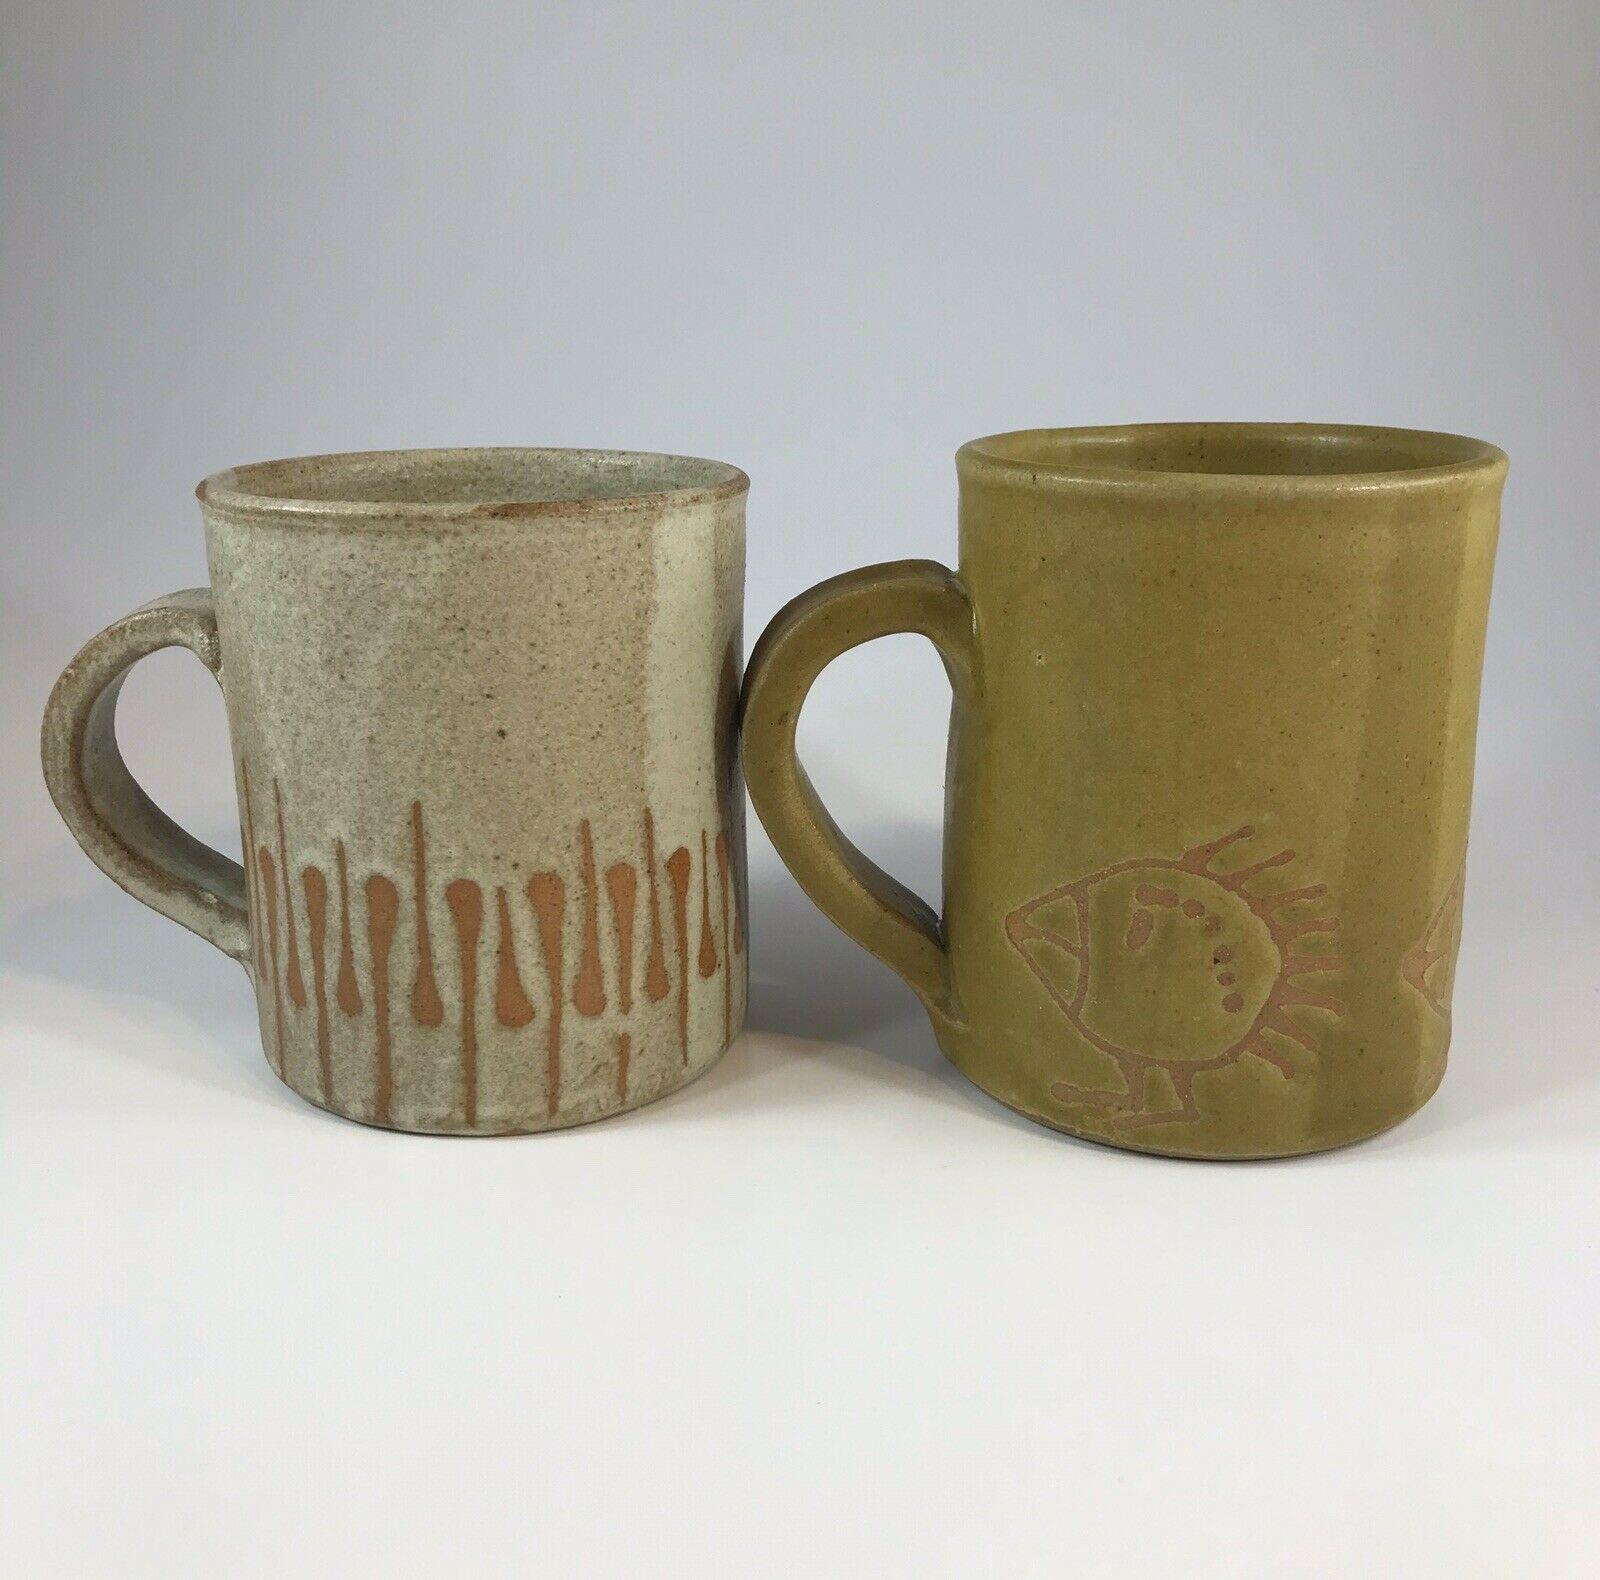 #pottery #handmade #handcrafted #studio #potterywheel #artwork #stoneware #potterylover #potterycollector #linkinbio #ebay #wheelthrown #homedecor #home #life